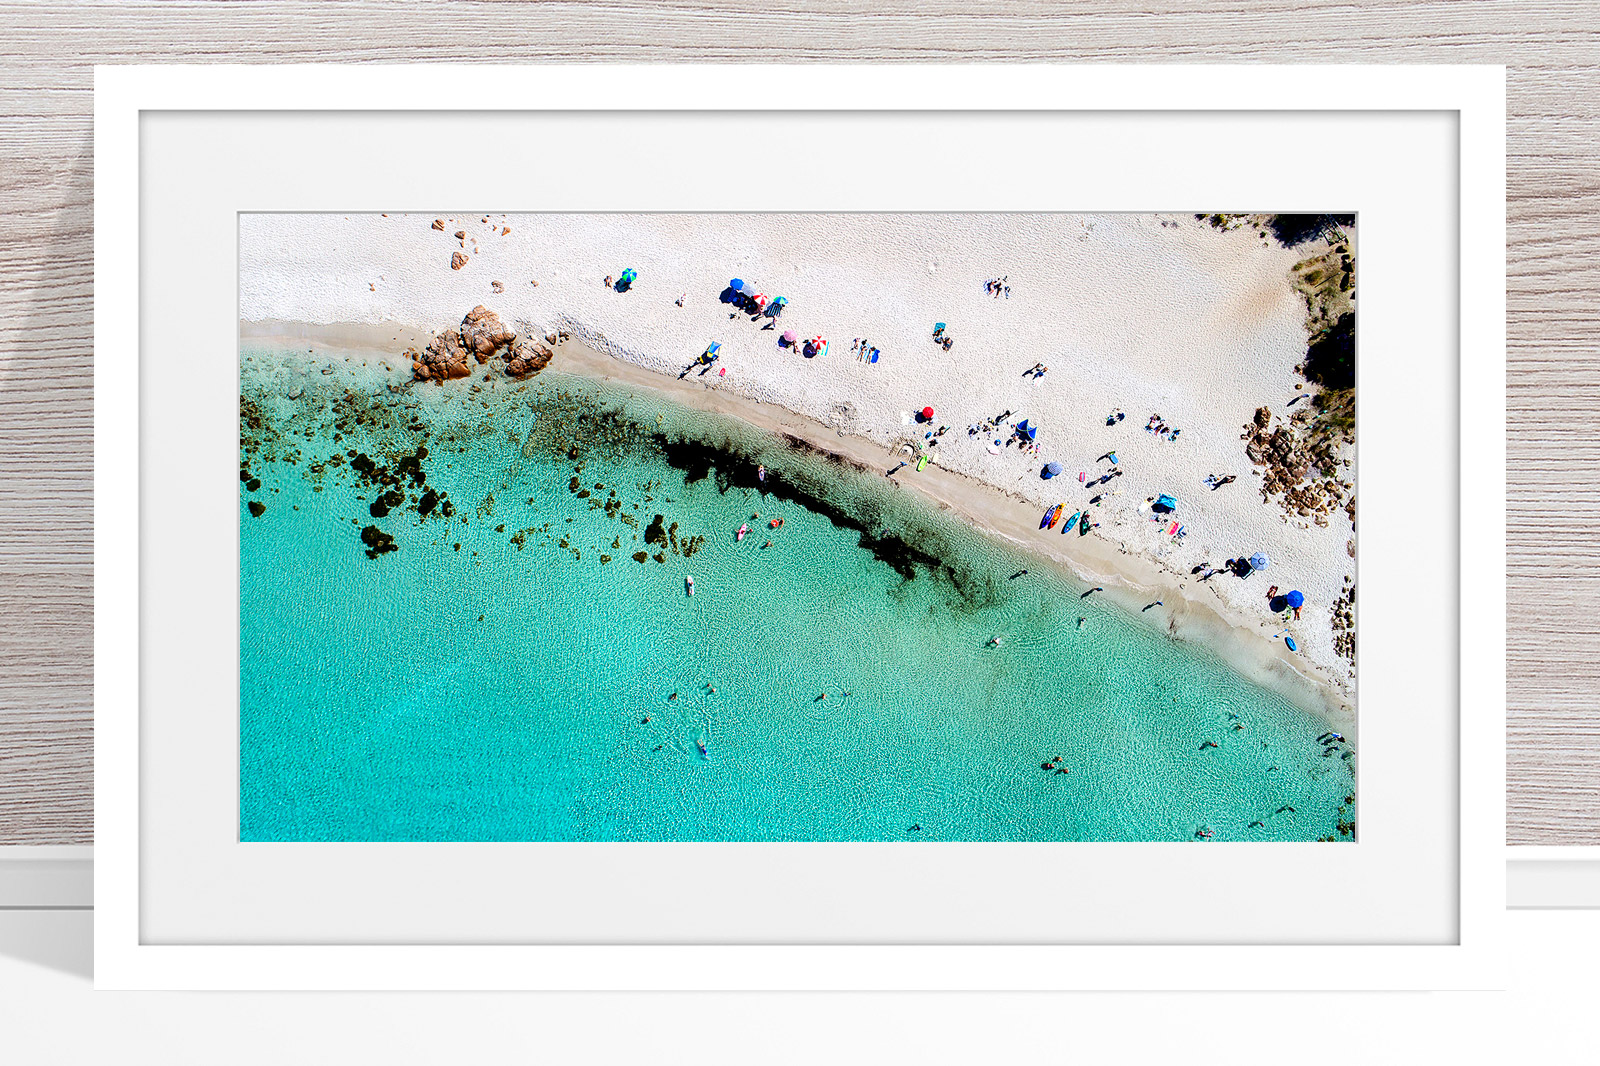 015 - Jason Mazur - 'Castle Bay Beach, Dunsborough' White Frame